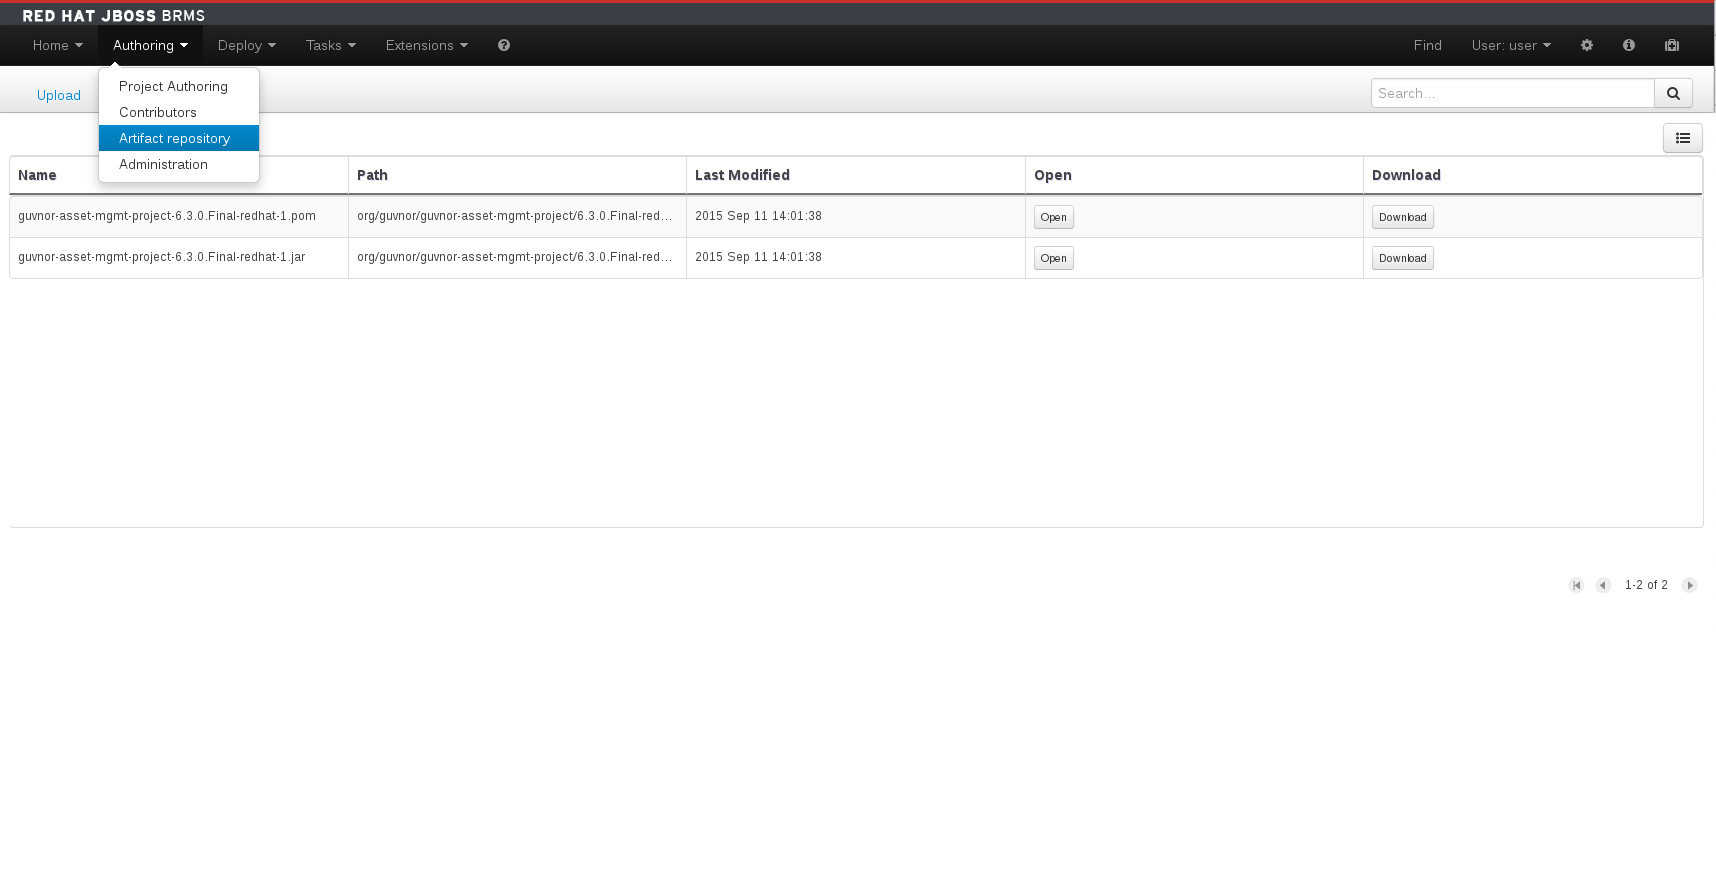 A screenshot of the BRMS Asset Editor - Guvnor M2 Repository Explorer